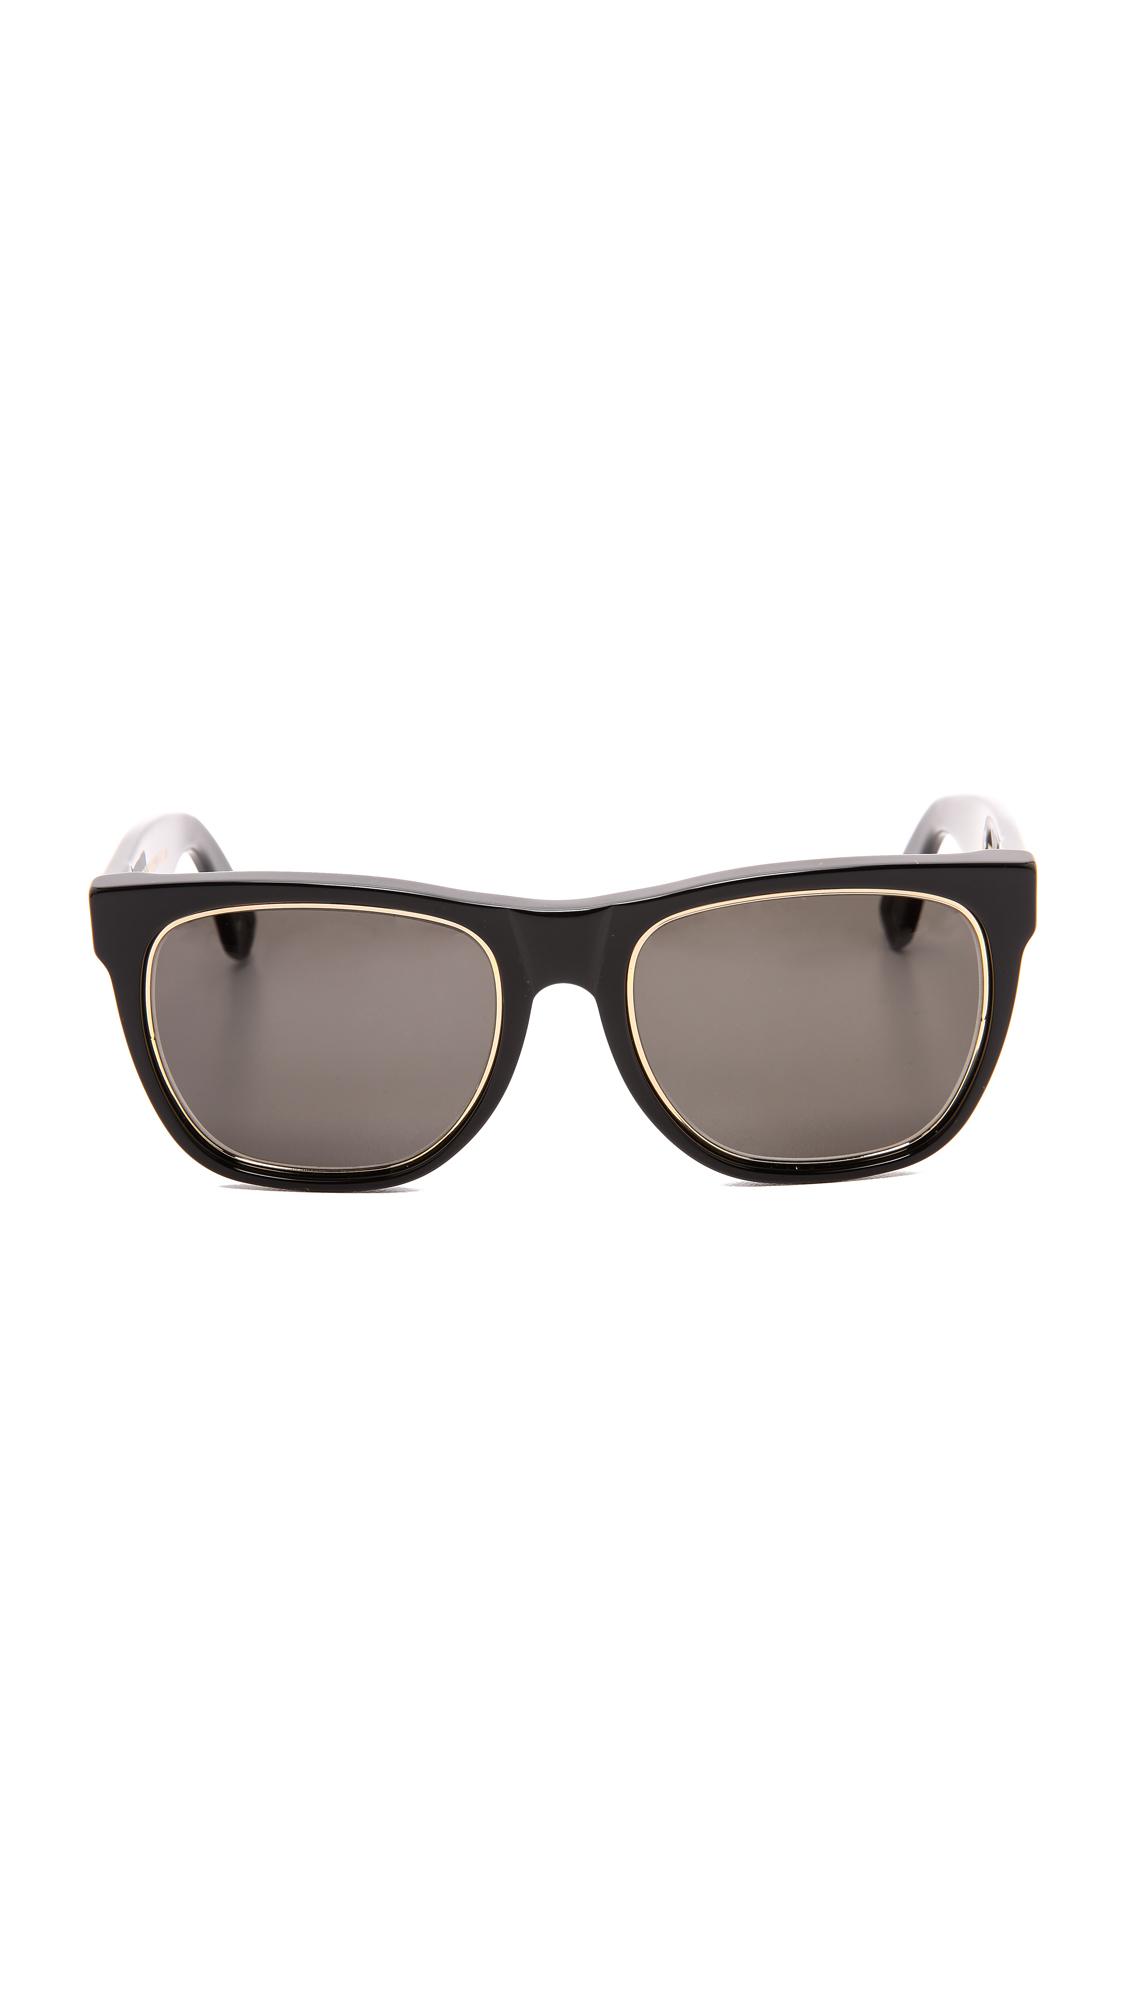 Retrosuperfuture Classic Impero Sunglassess in Black